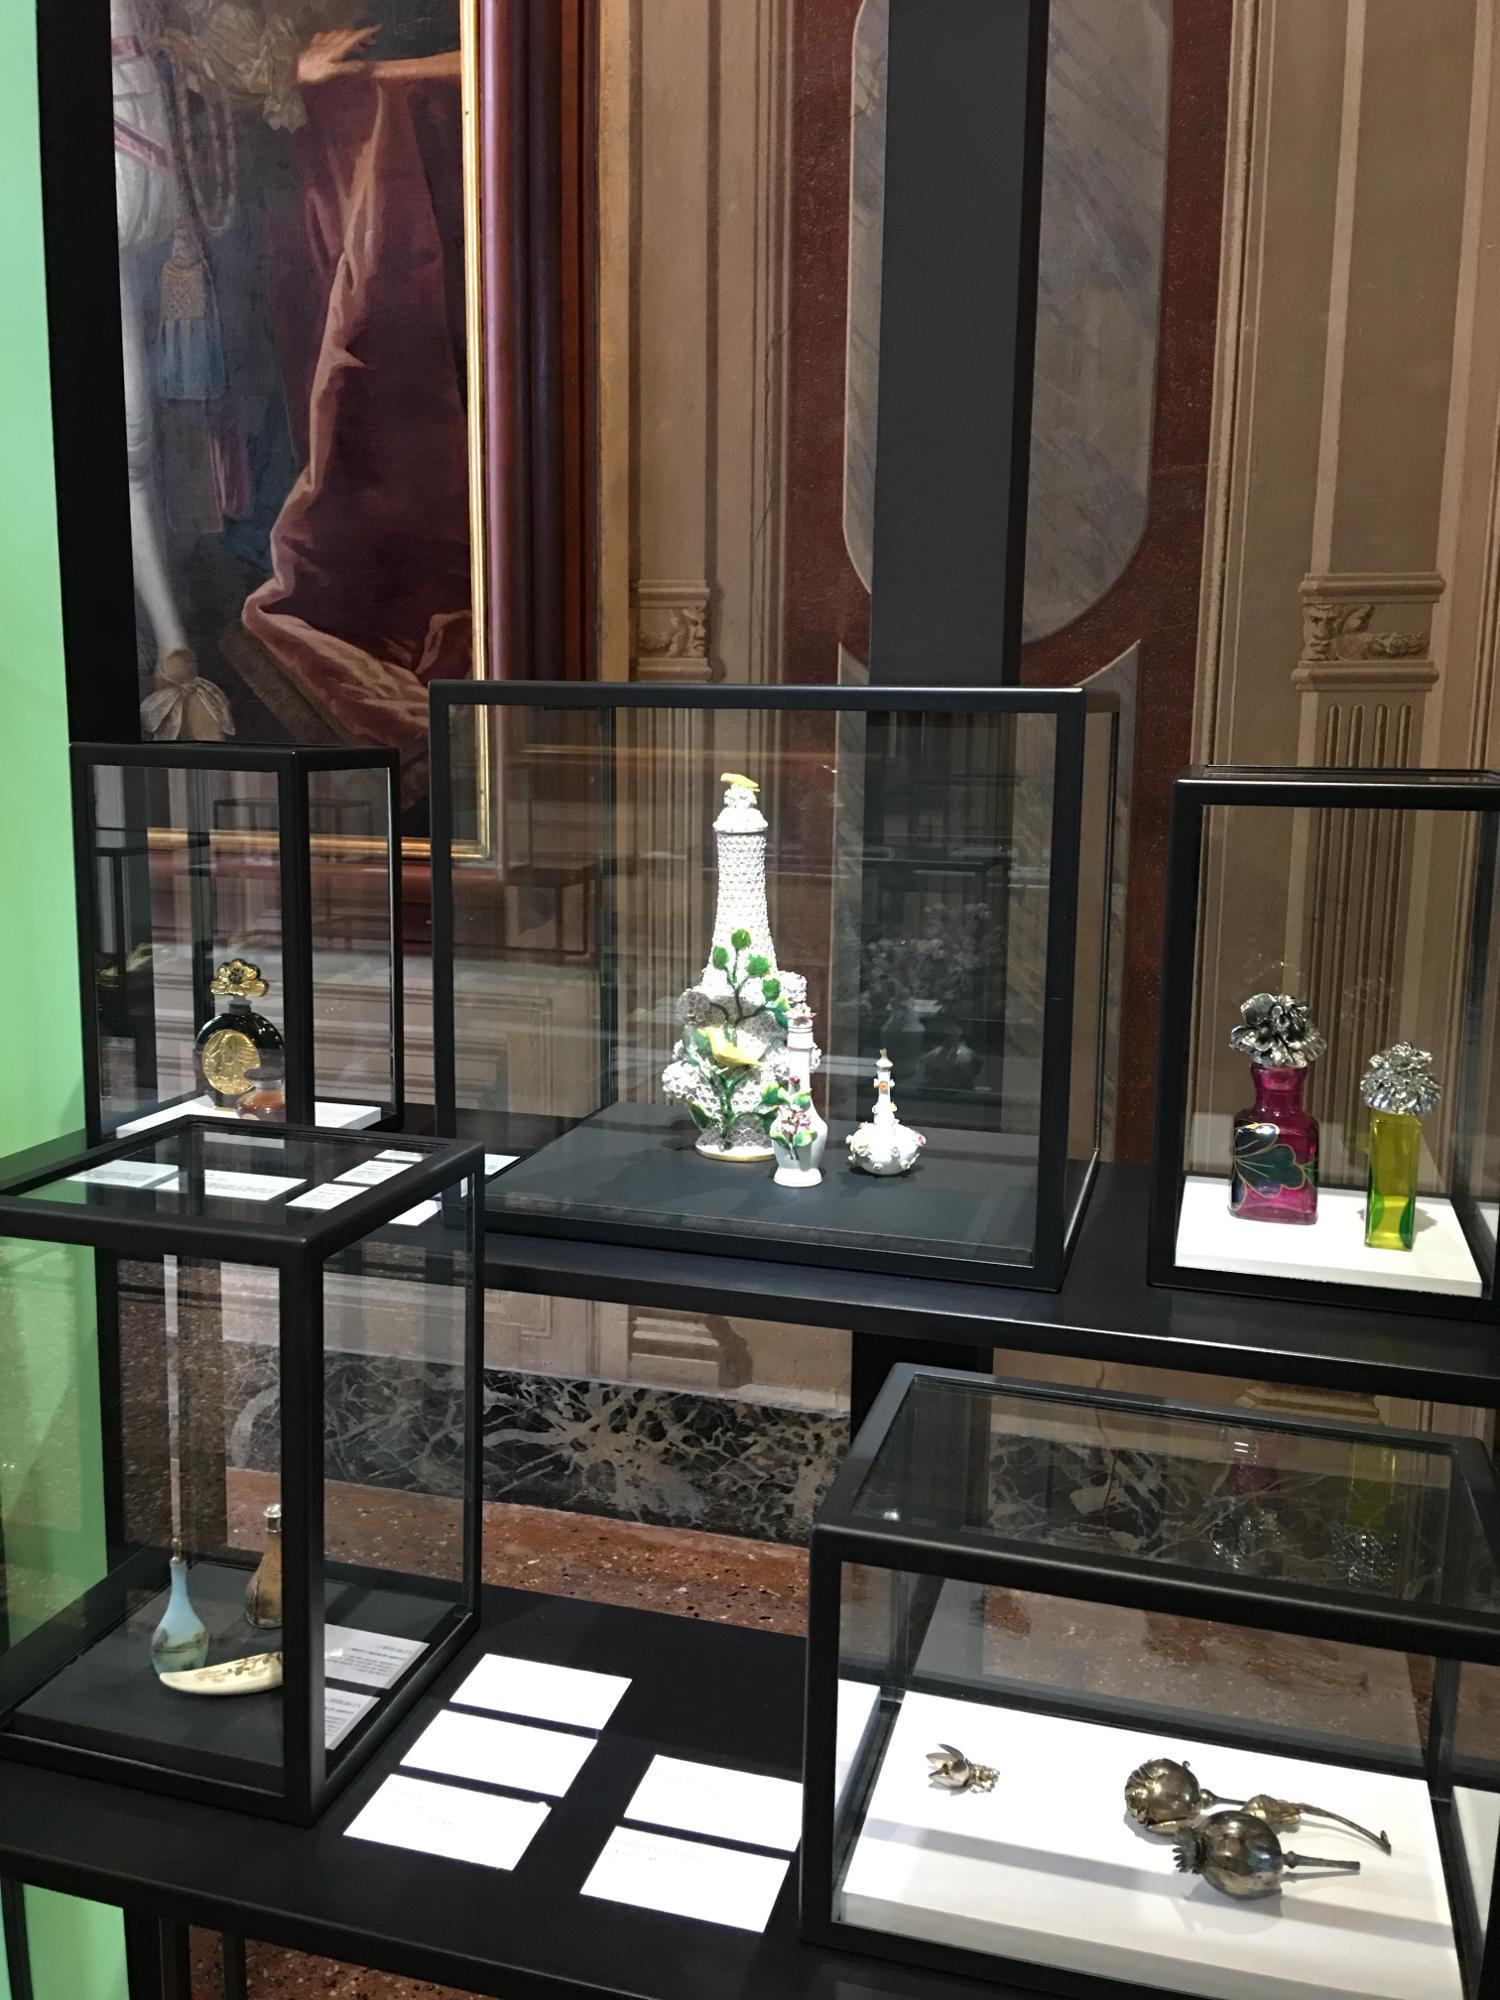 rocaille-blog-venezia-palazzo-mocenigo-cabinet-of-curiosities-collezione-storp-profumo-28